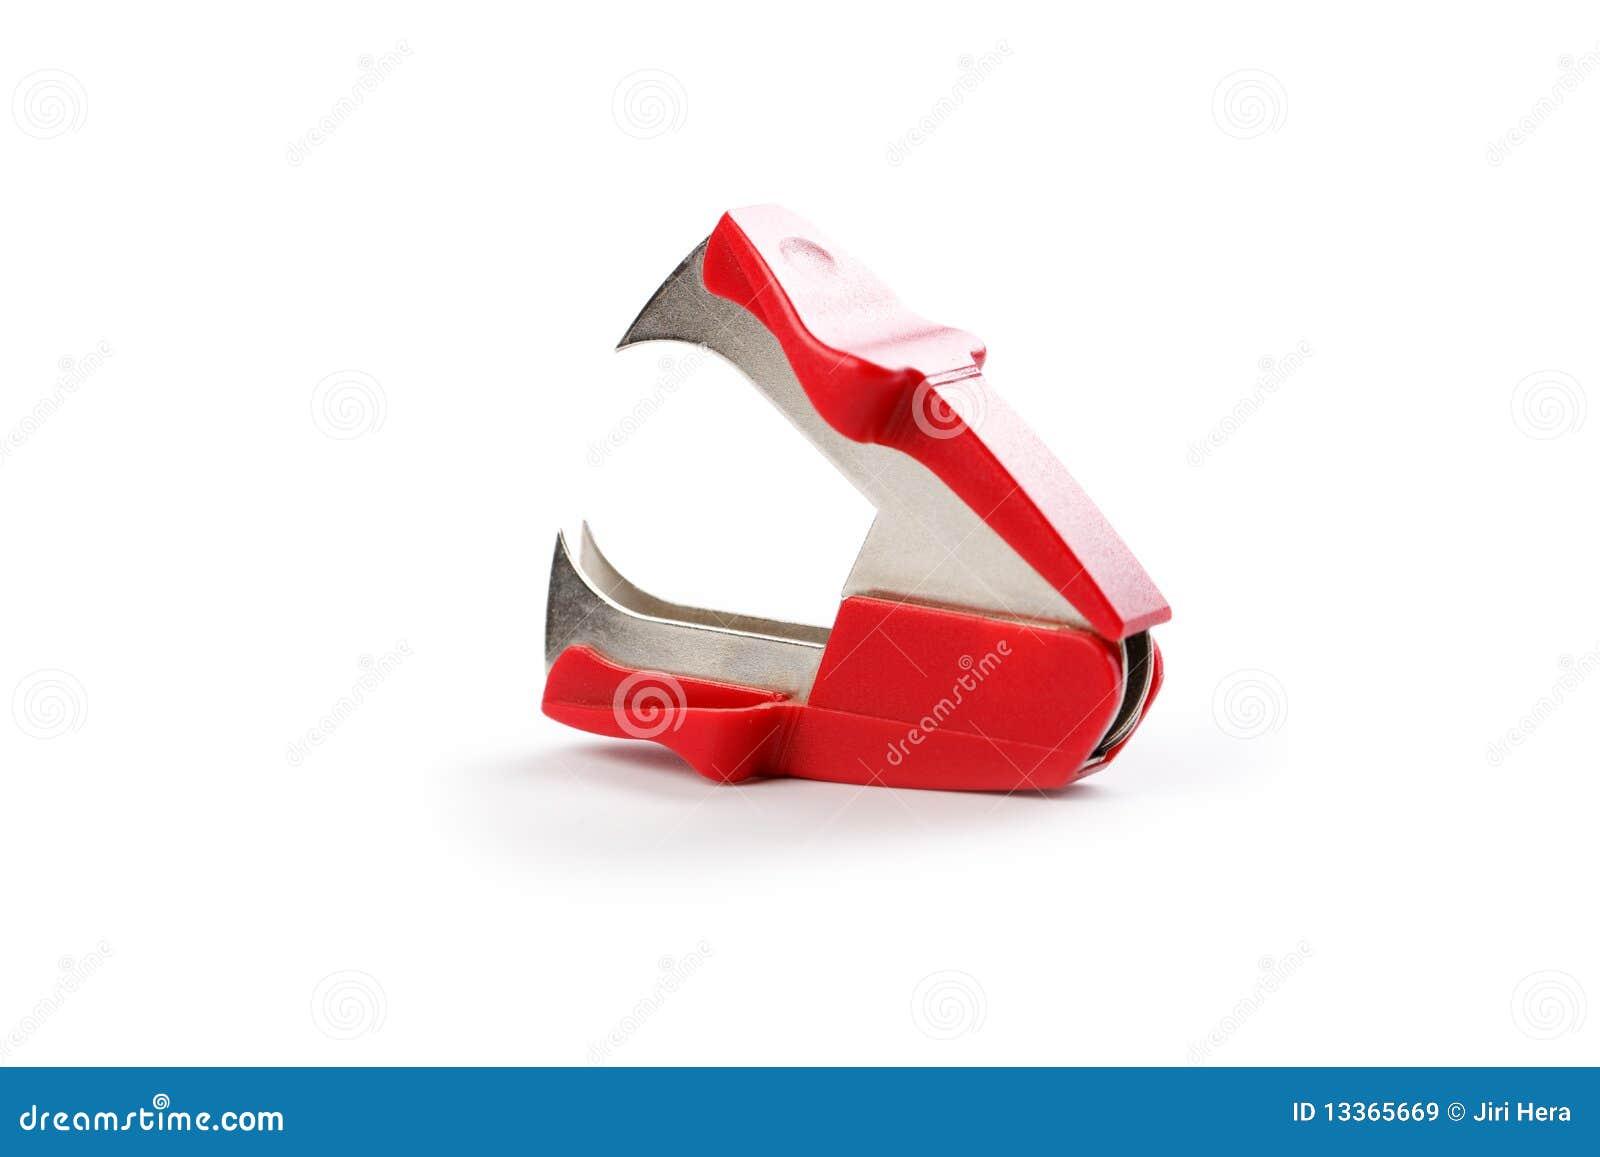 Anti stapler